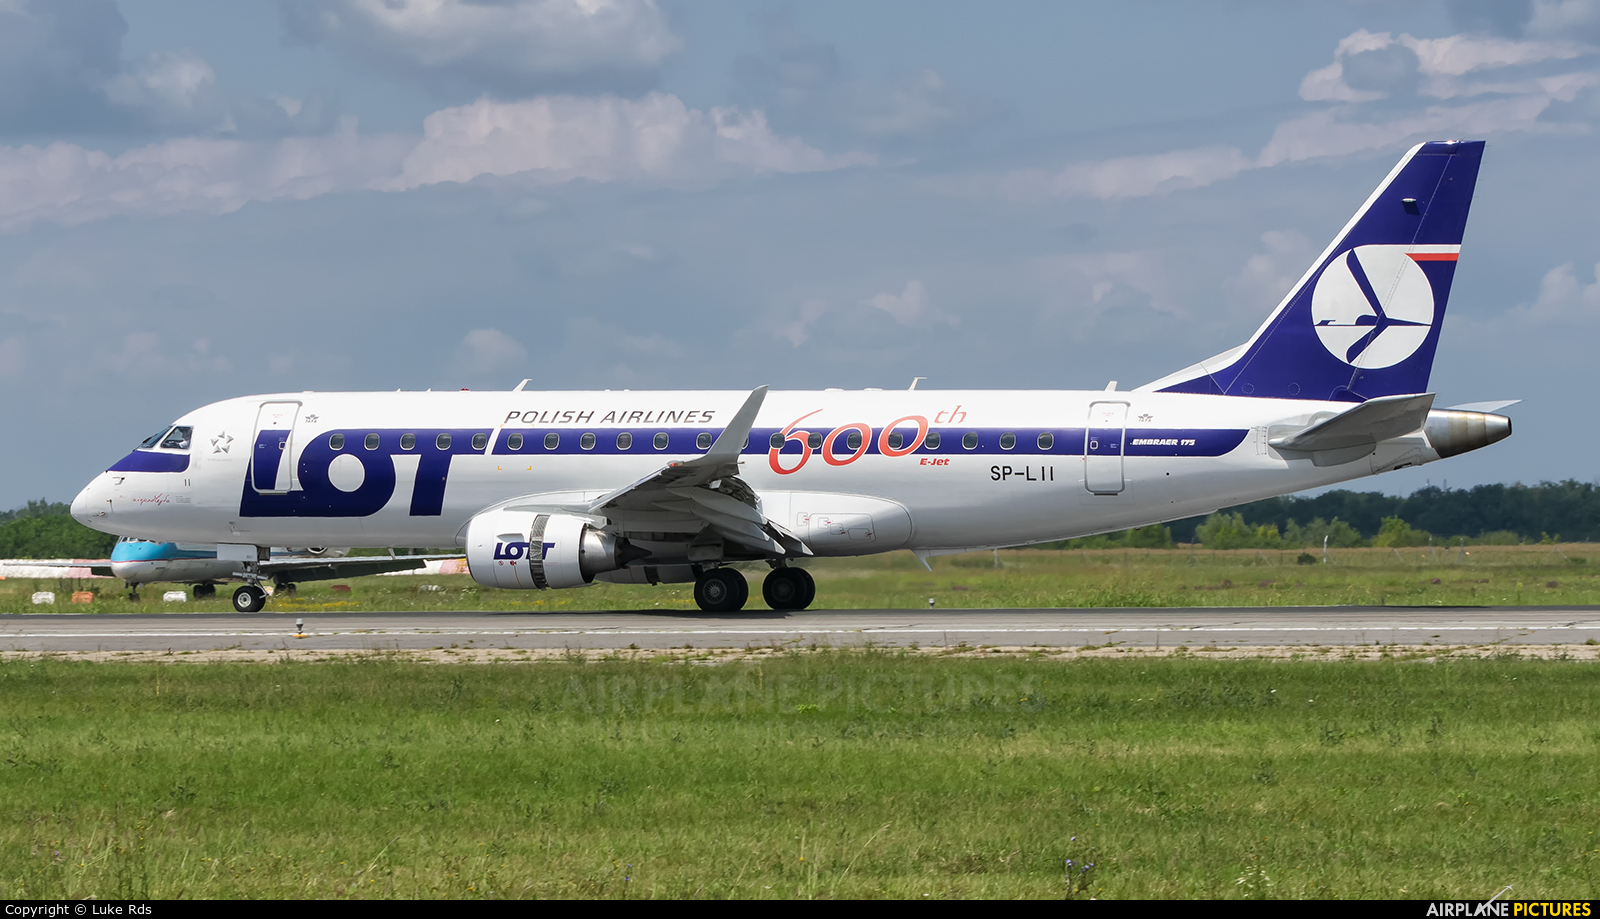 LOT - Polish Airlines SP-LII aircraft at Bucharest - Henri Coandă